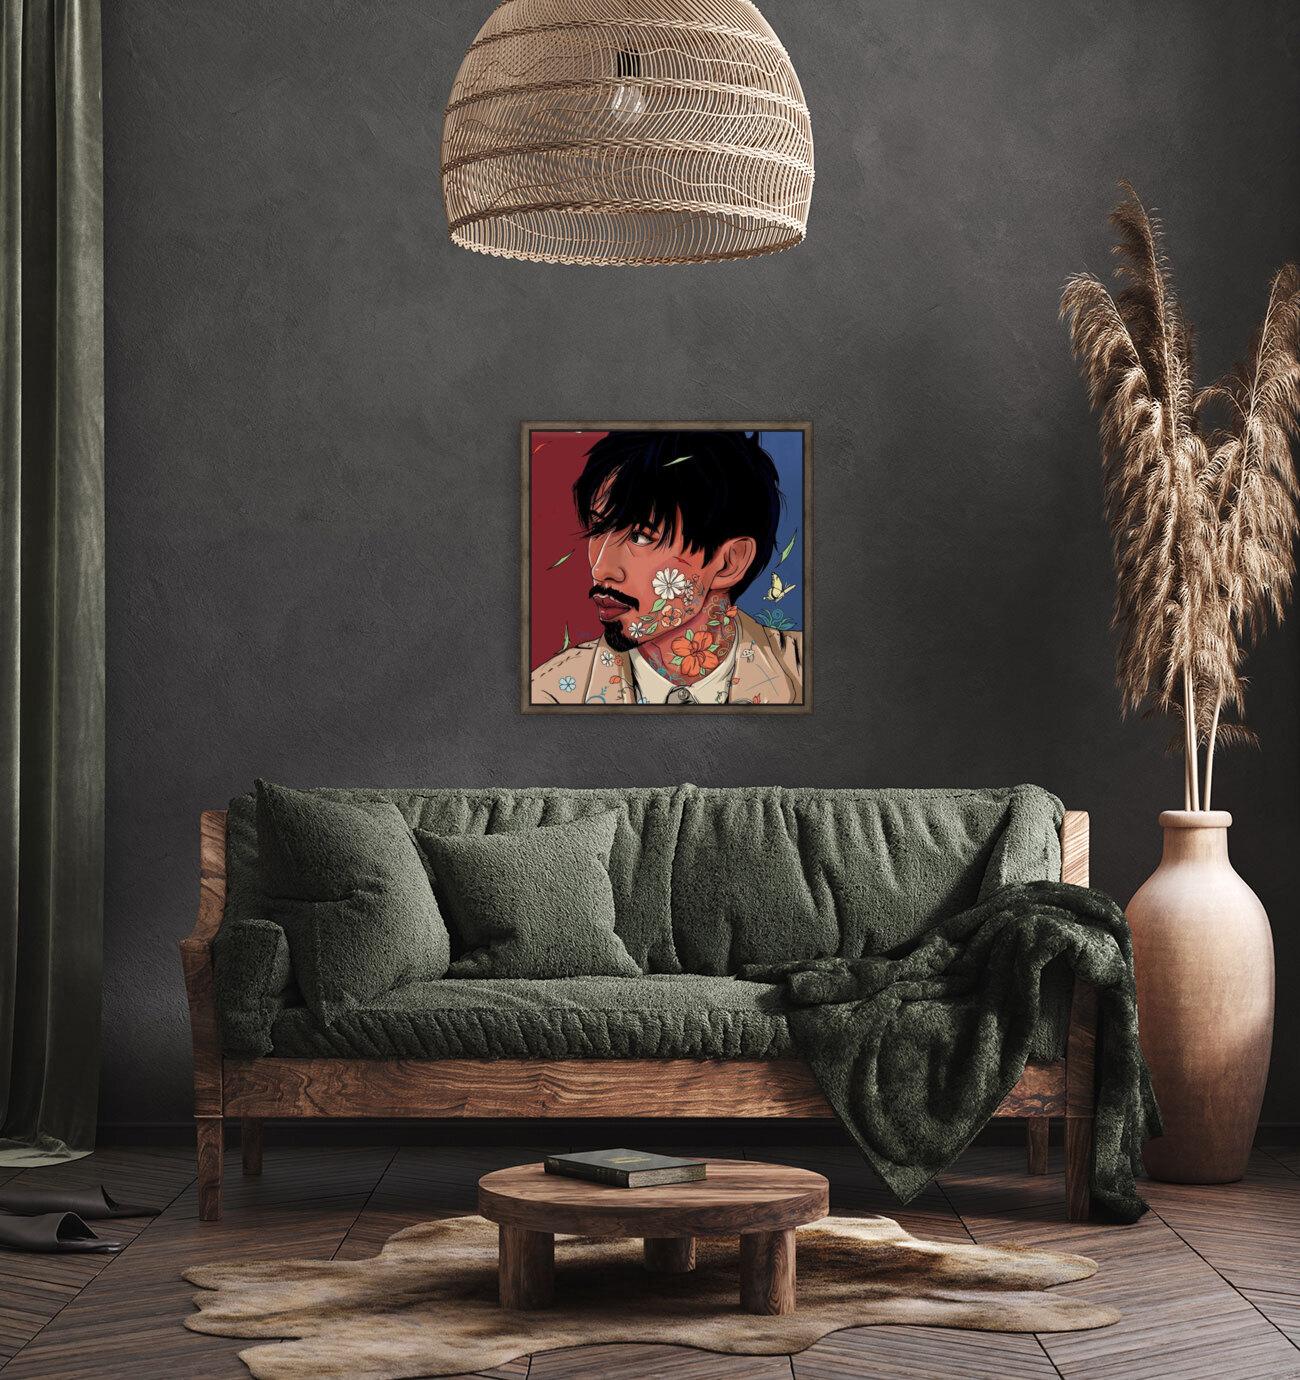 Portrait Painting In The MV Hide and Seek  Art